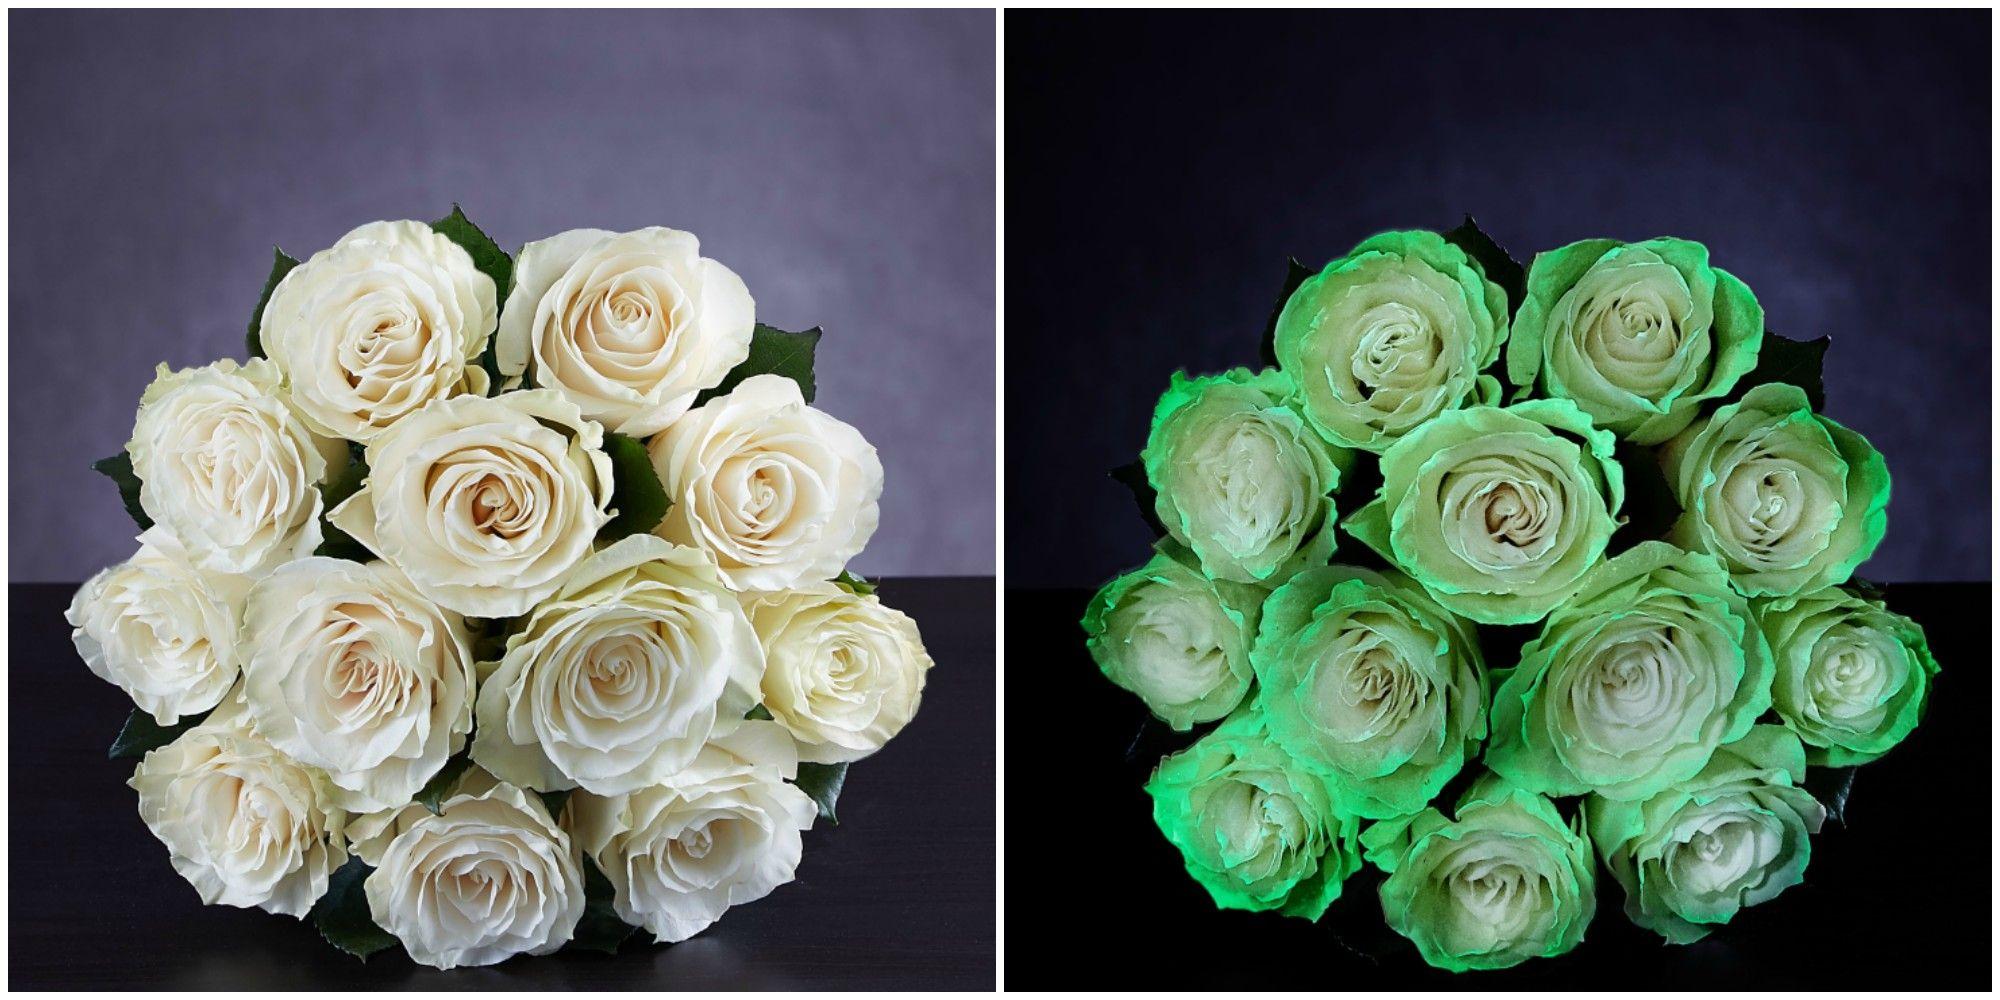 Spooky Glow-in-the-Dark Roses Now Exist - Halloween Flowers